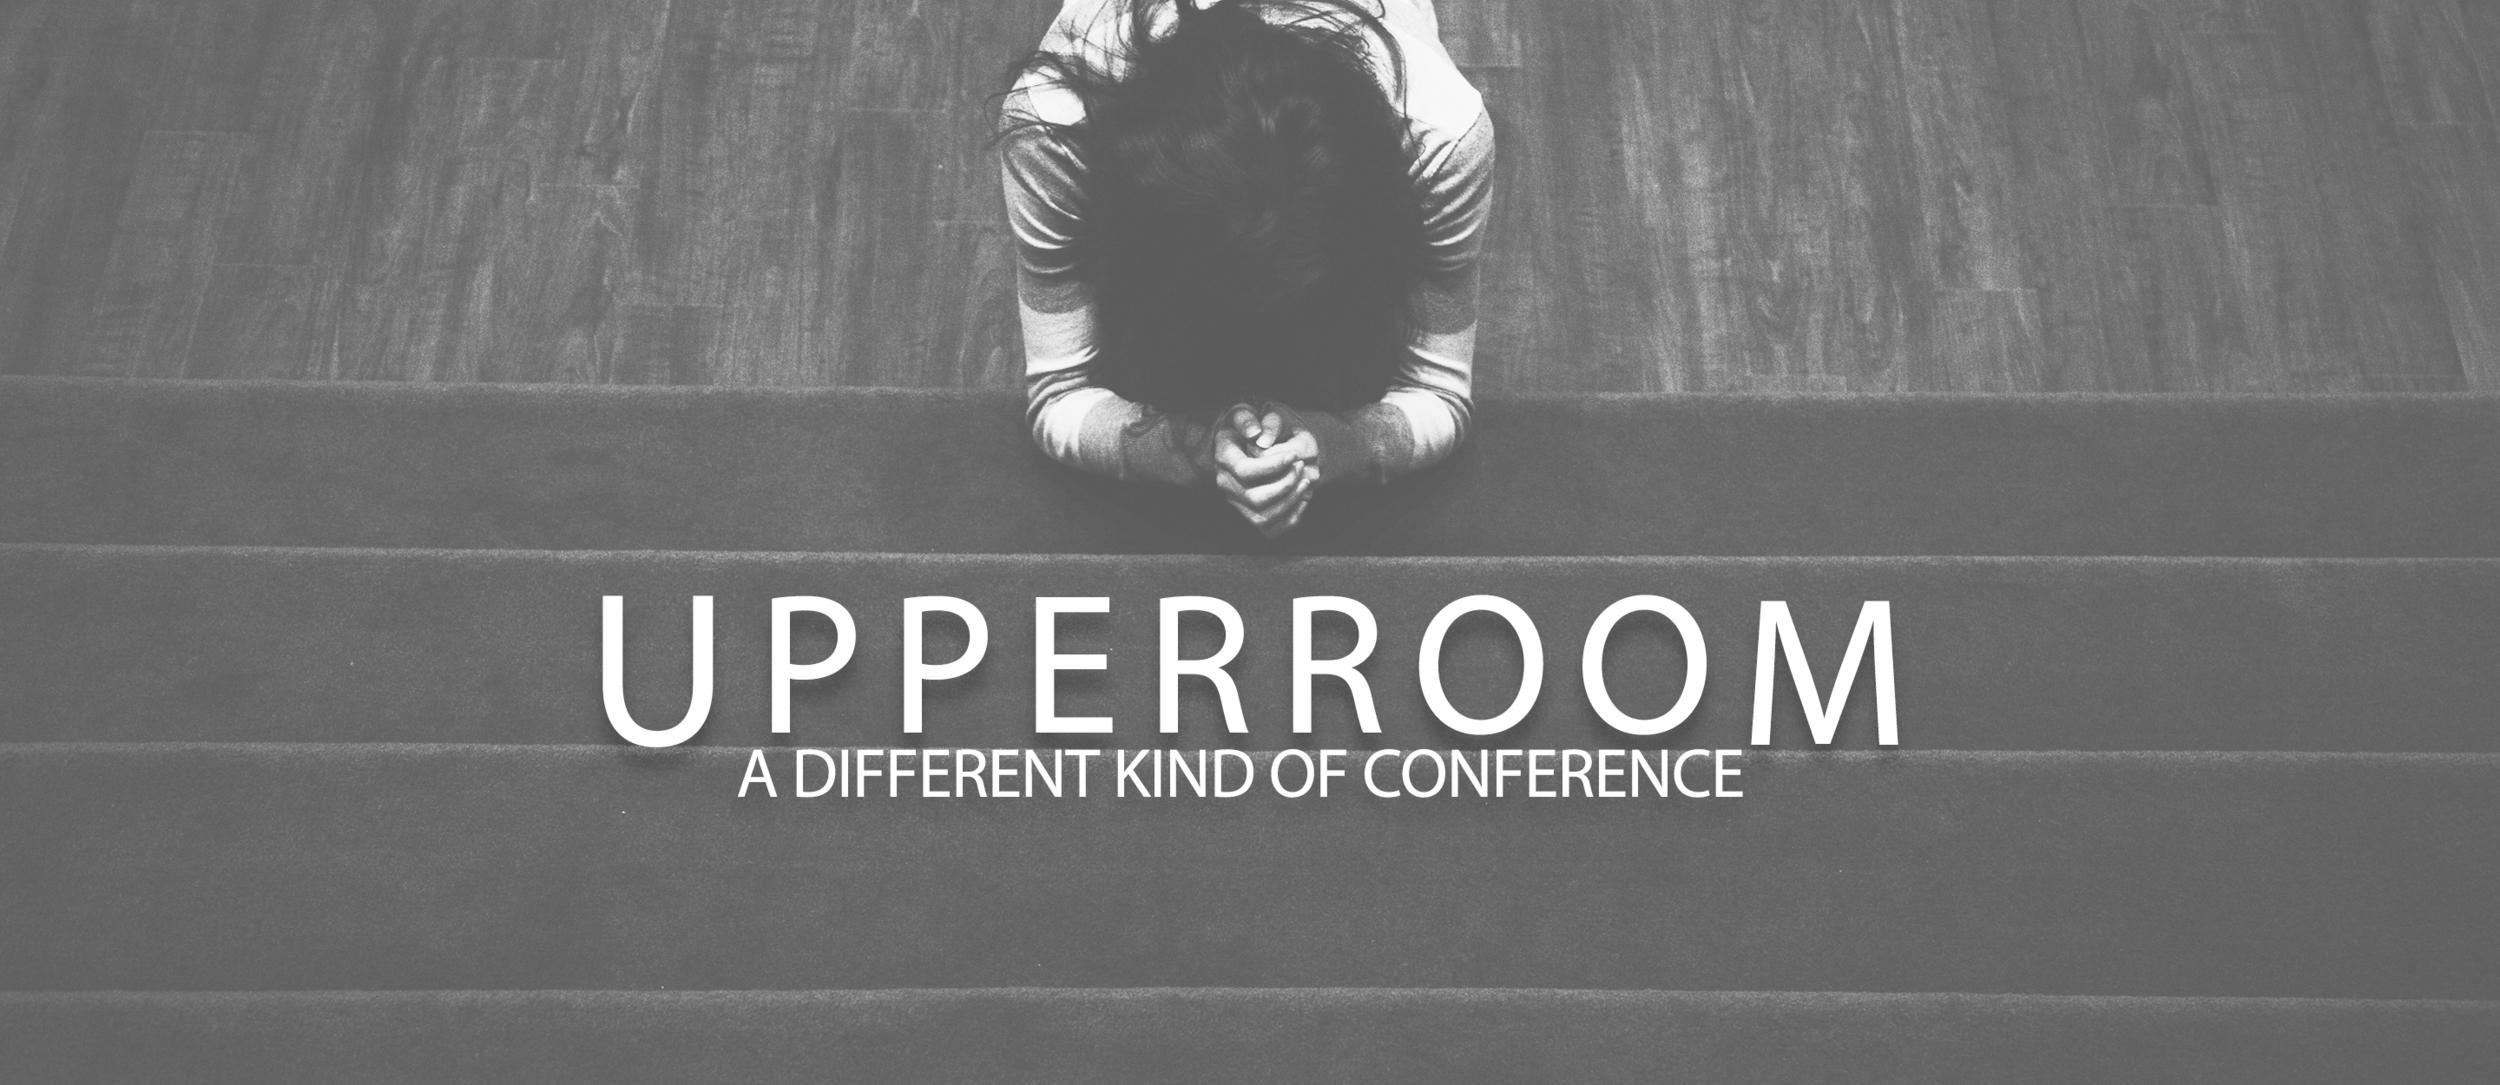 UpperRoom Logo.png